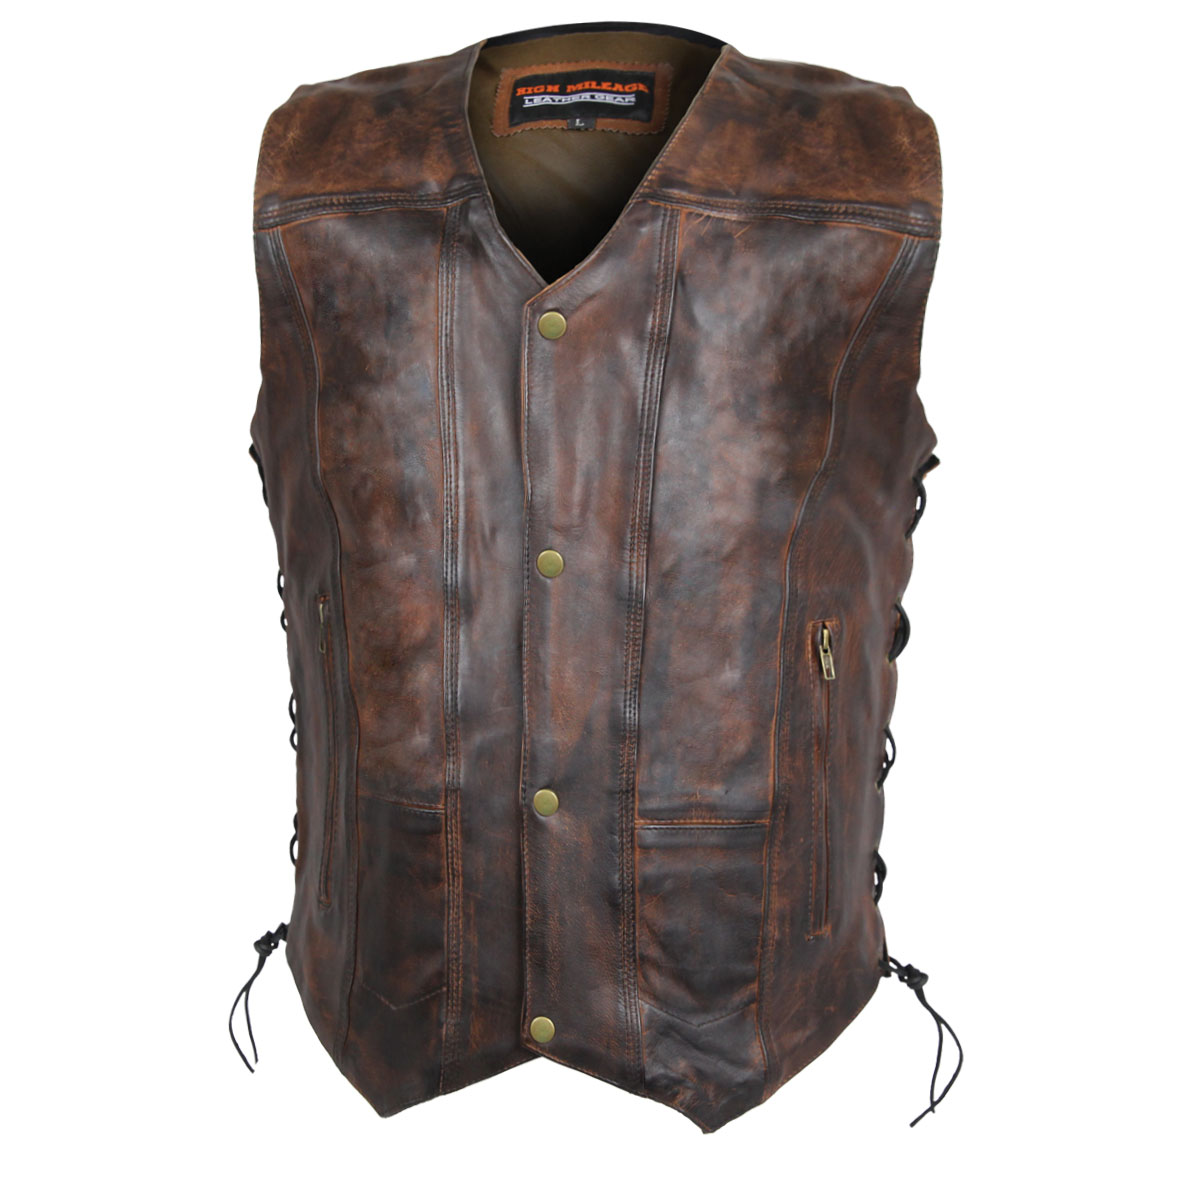 Vance Leathers Men's Classic Lightweight Vintage Brown Leather Vest